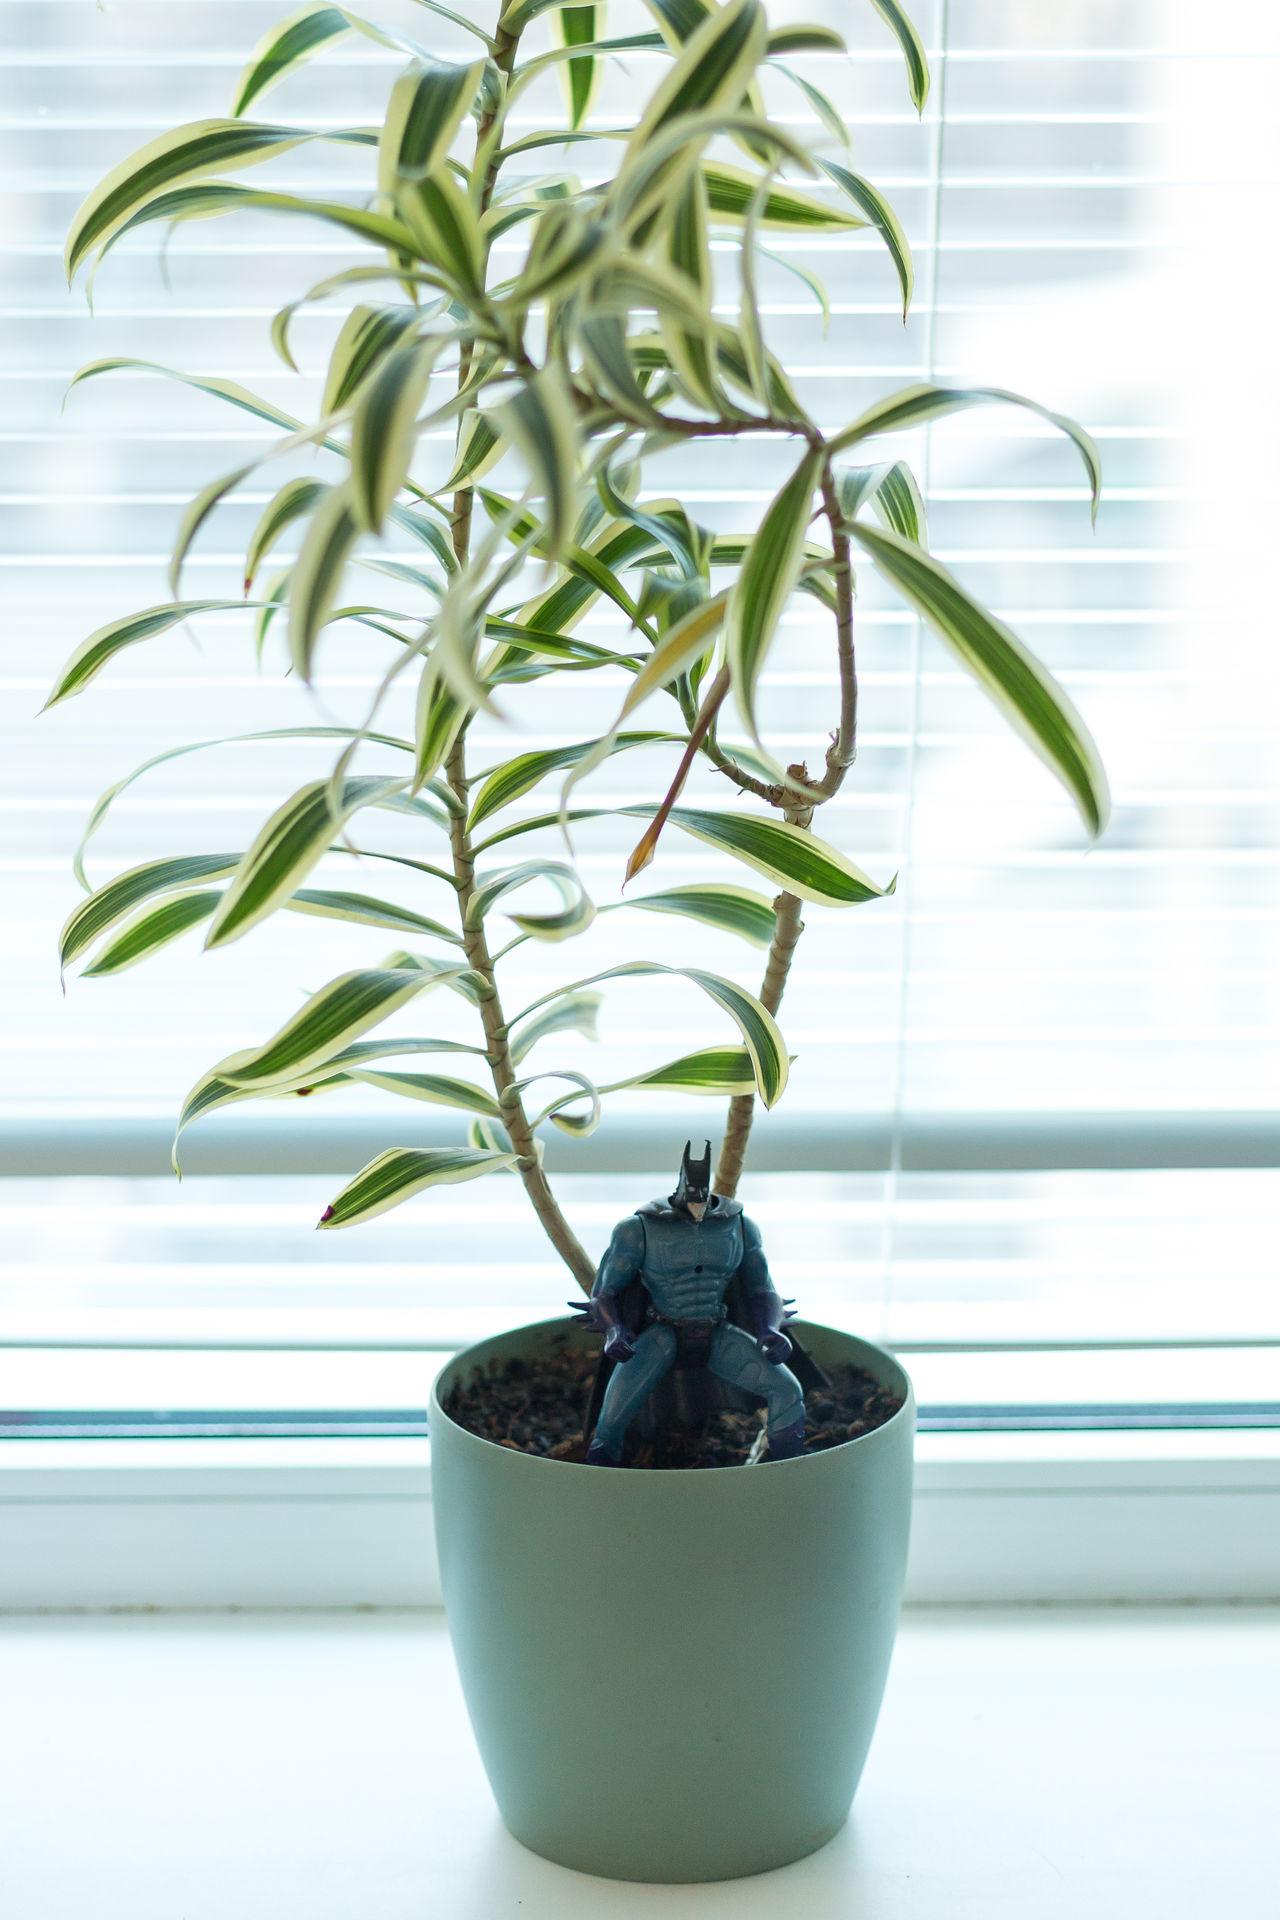 batman toy in the plant Batman Jalousie Plant Toy Venetian Blinds Window